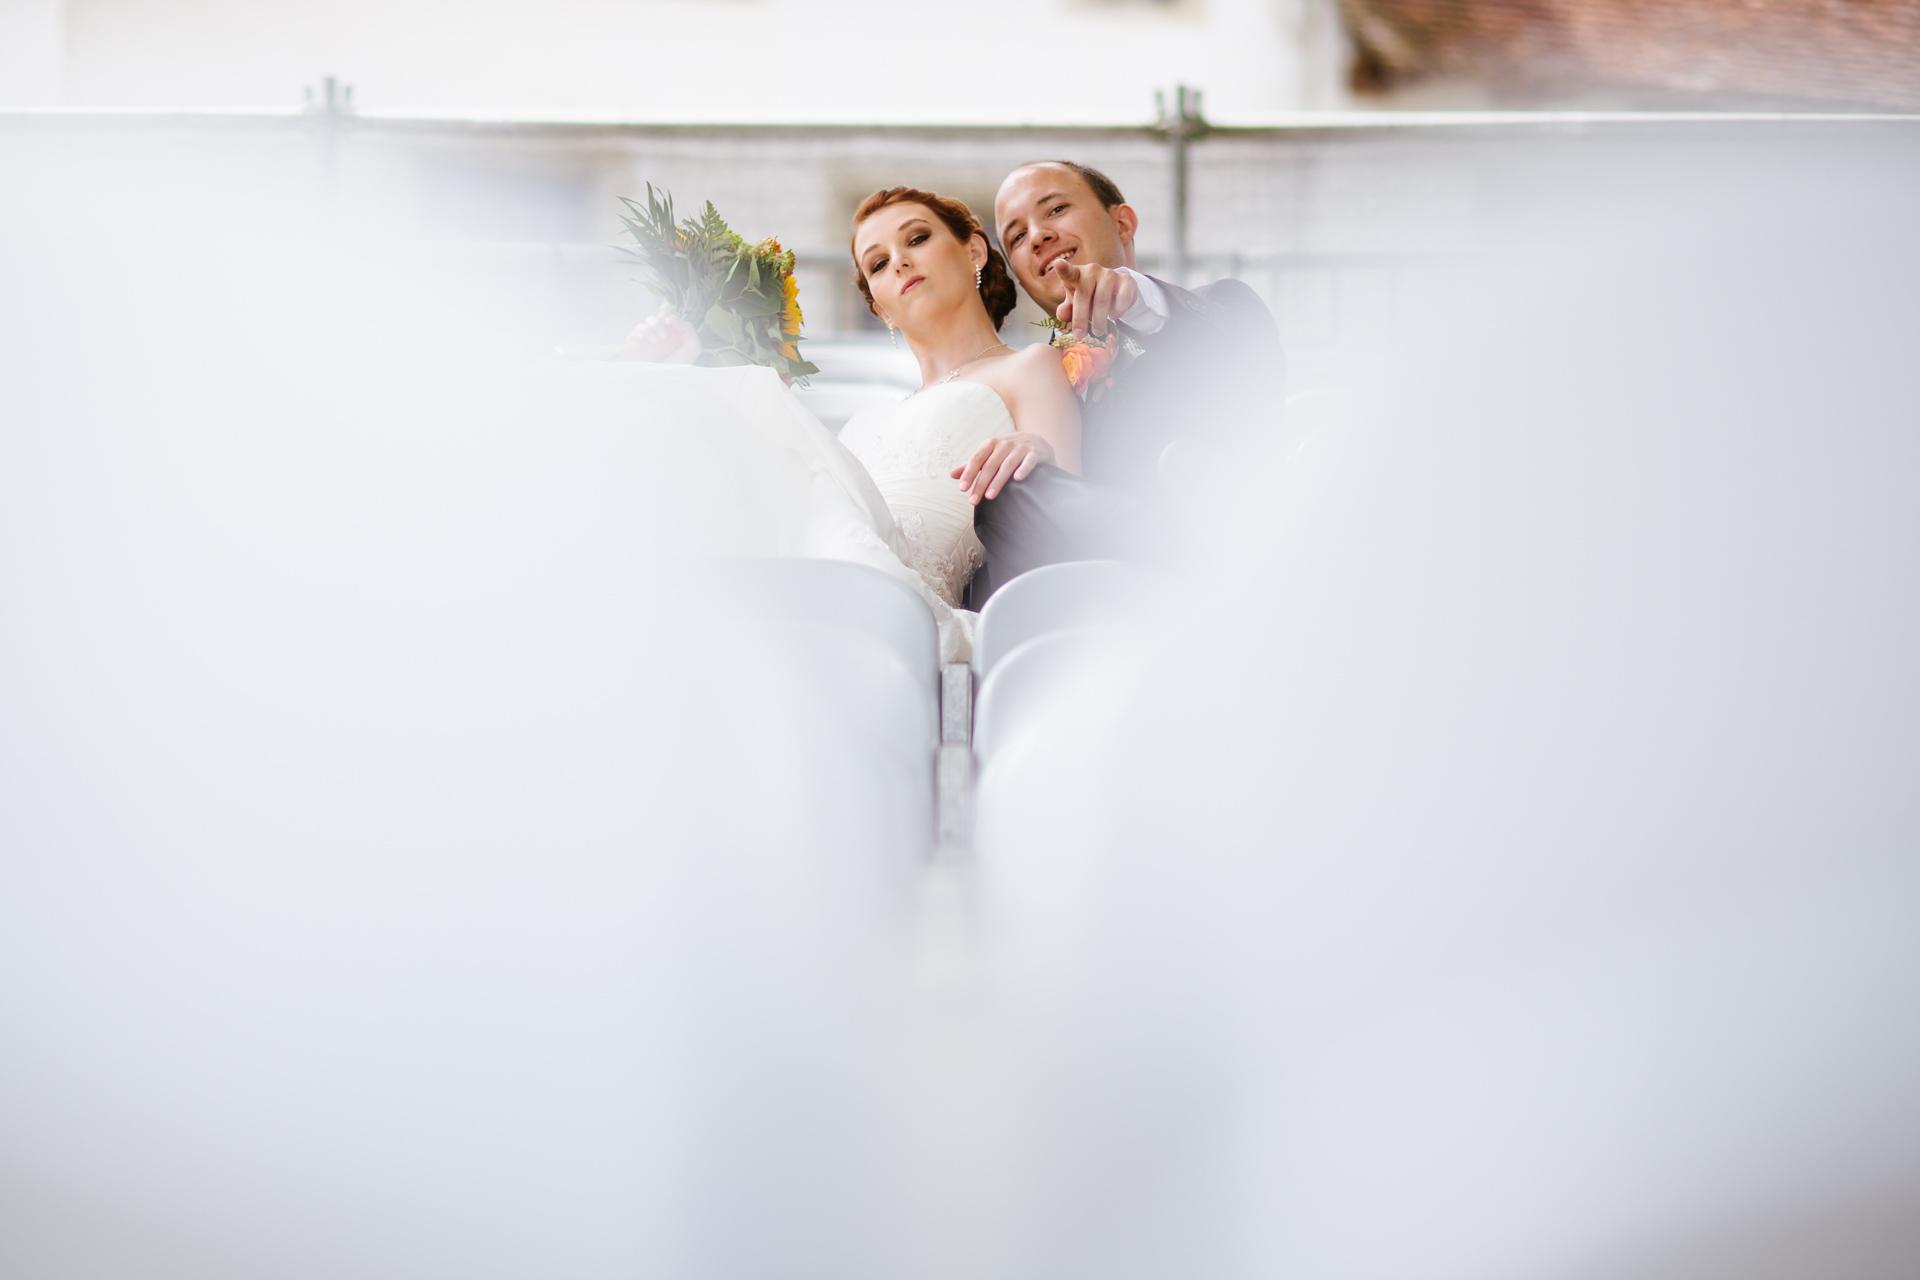 Pixelart_Hochzeitsfotografen_Loerrach_Rheinfelden_Hallwil_Schweiz_Linda-Ramon-1011